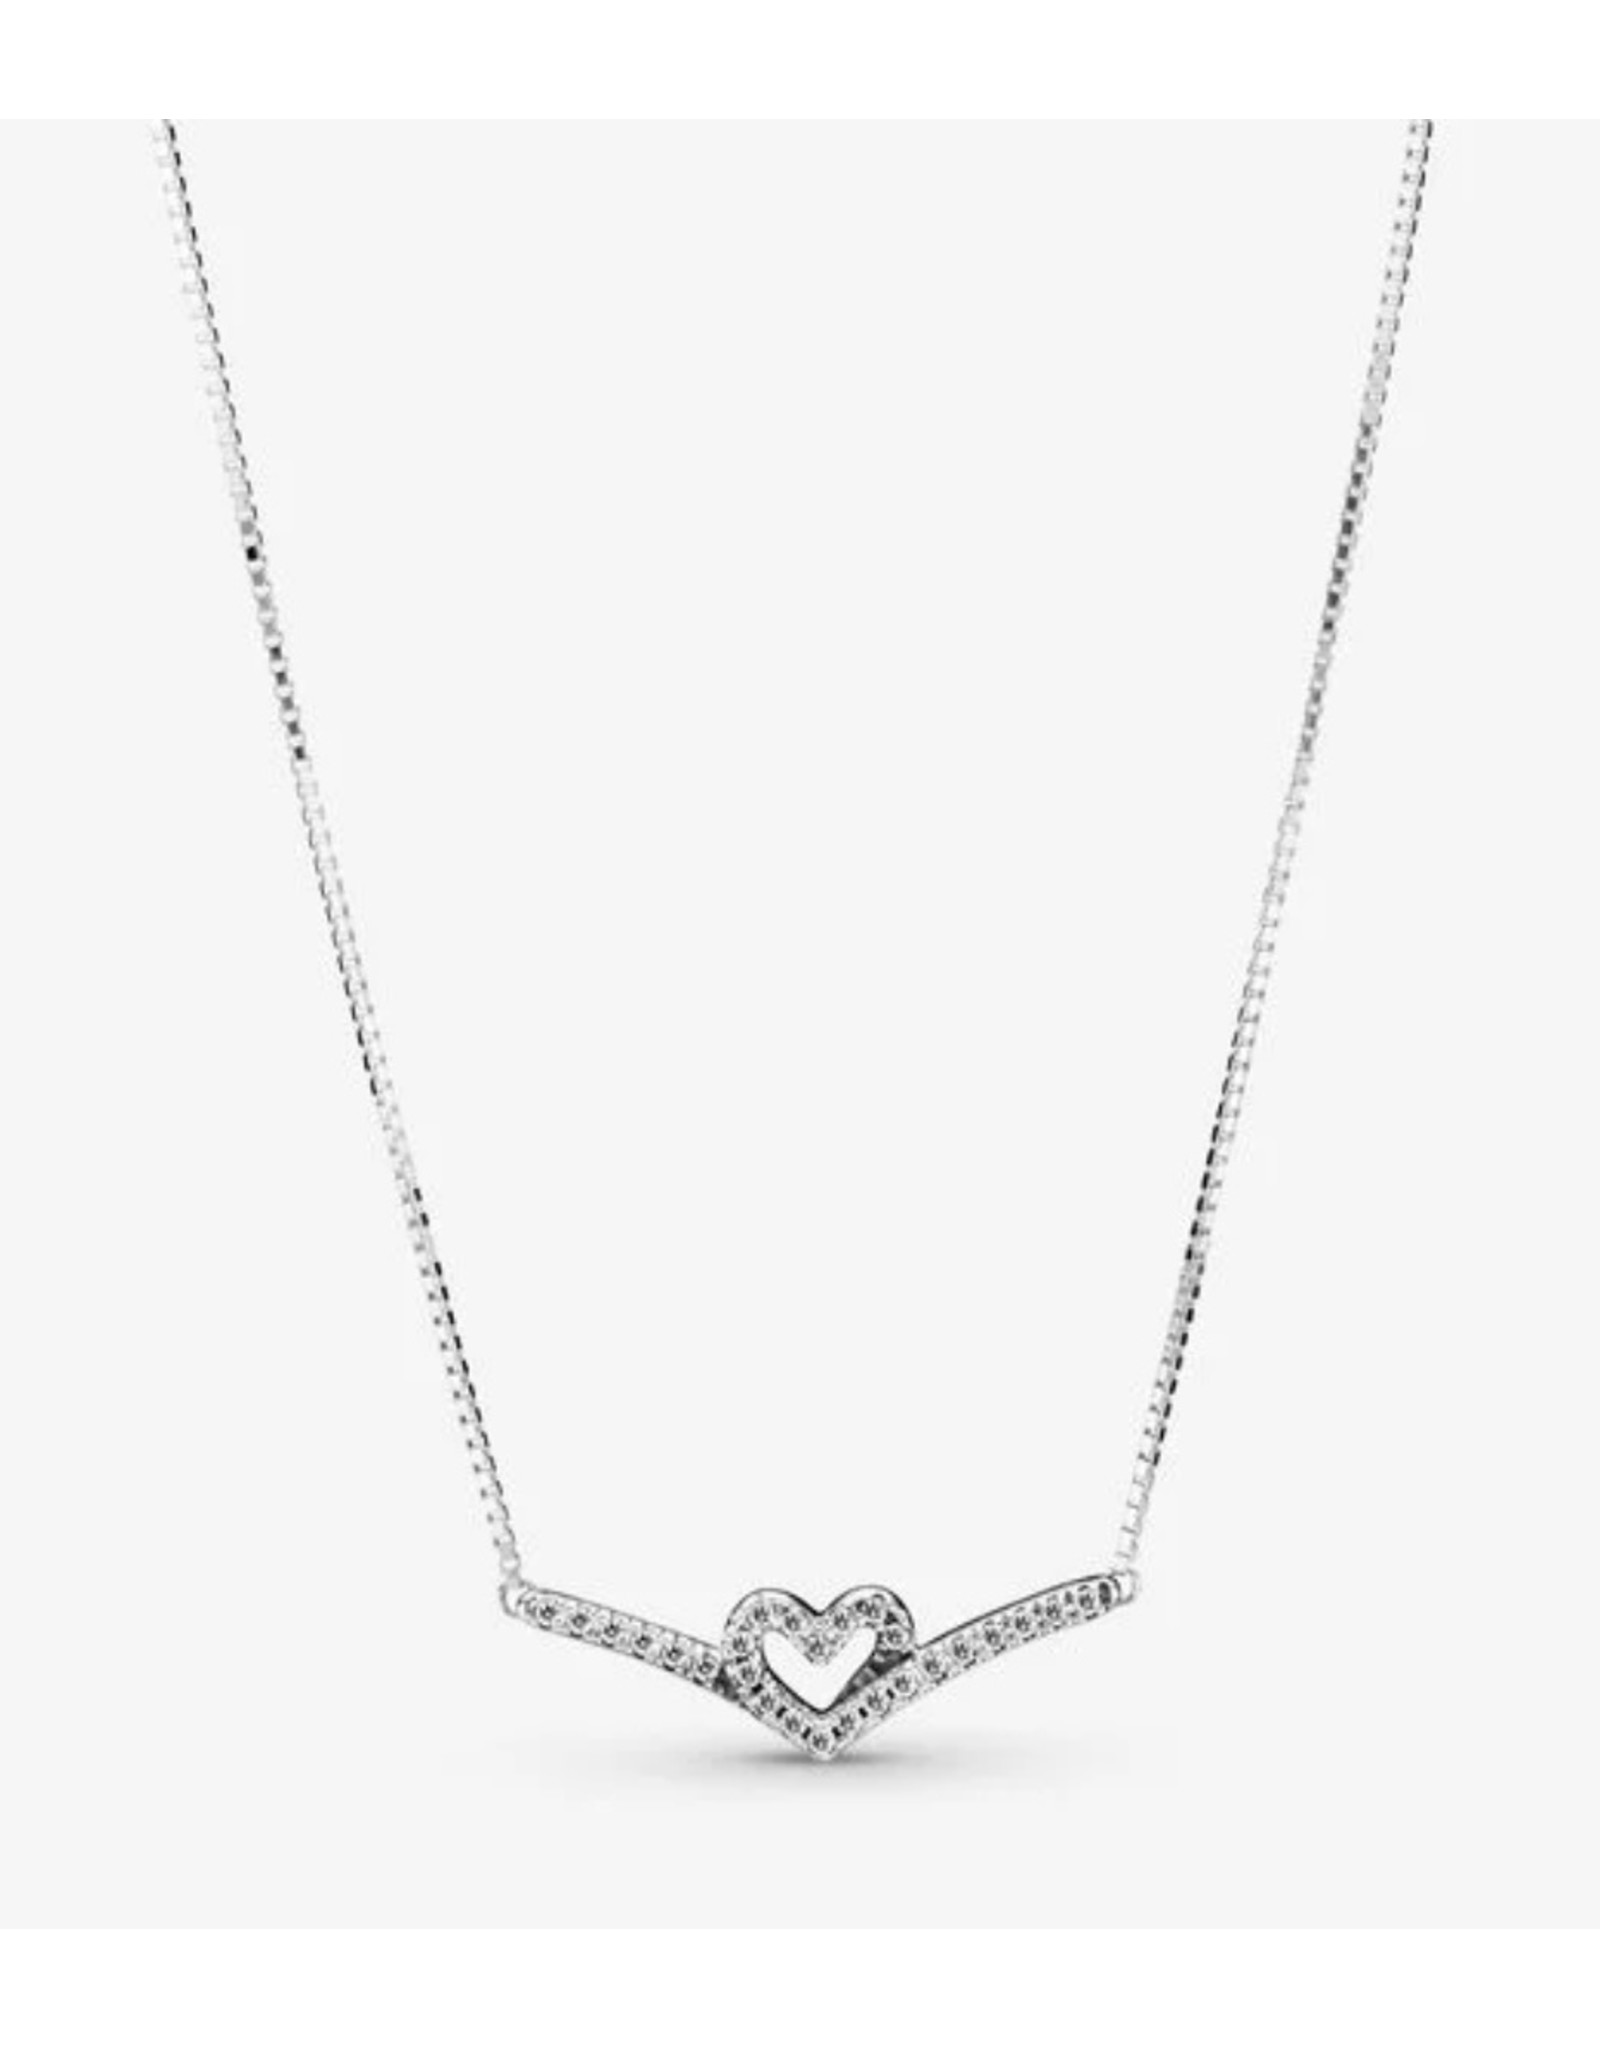 Pandora Pandora Necklace,399273C01-45,Sparkling Wishbone Heart, Clear CZ